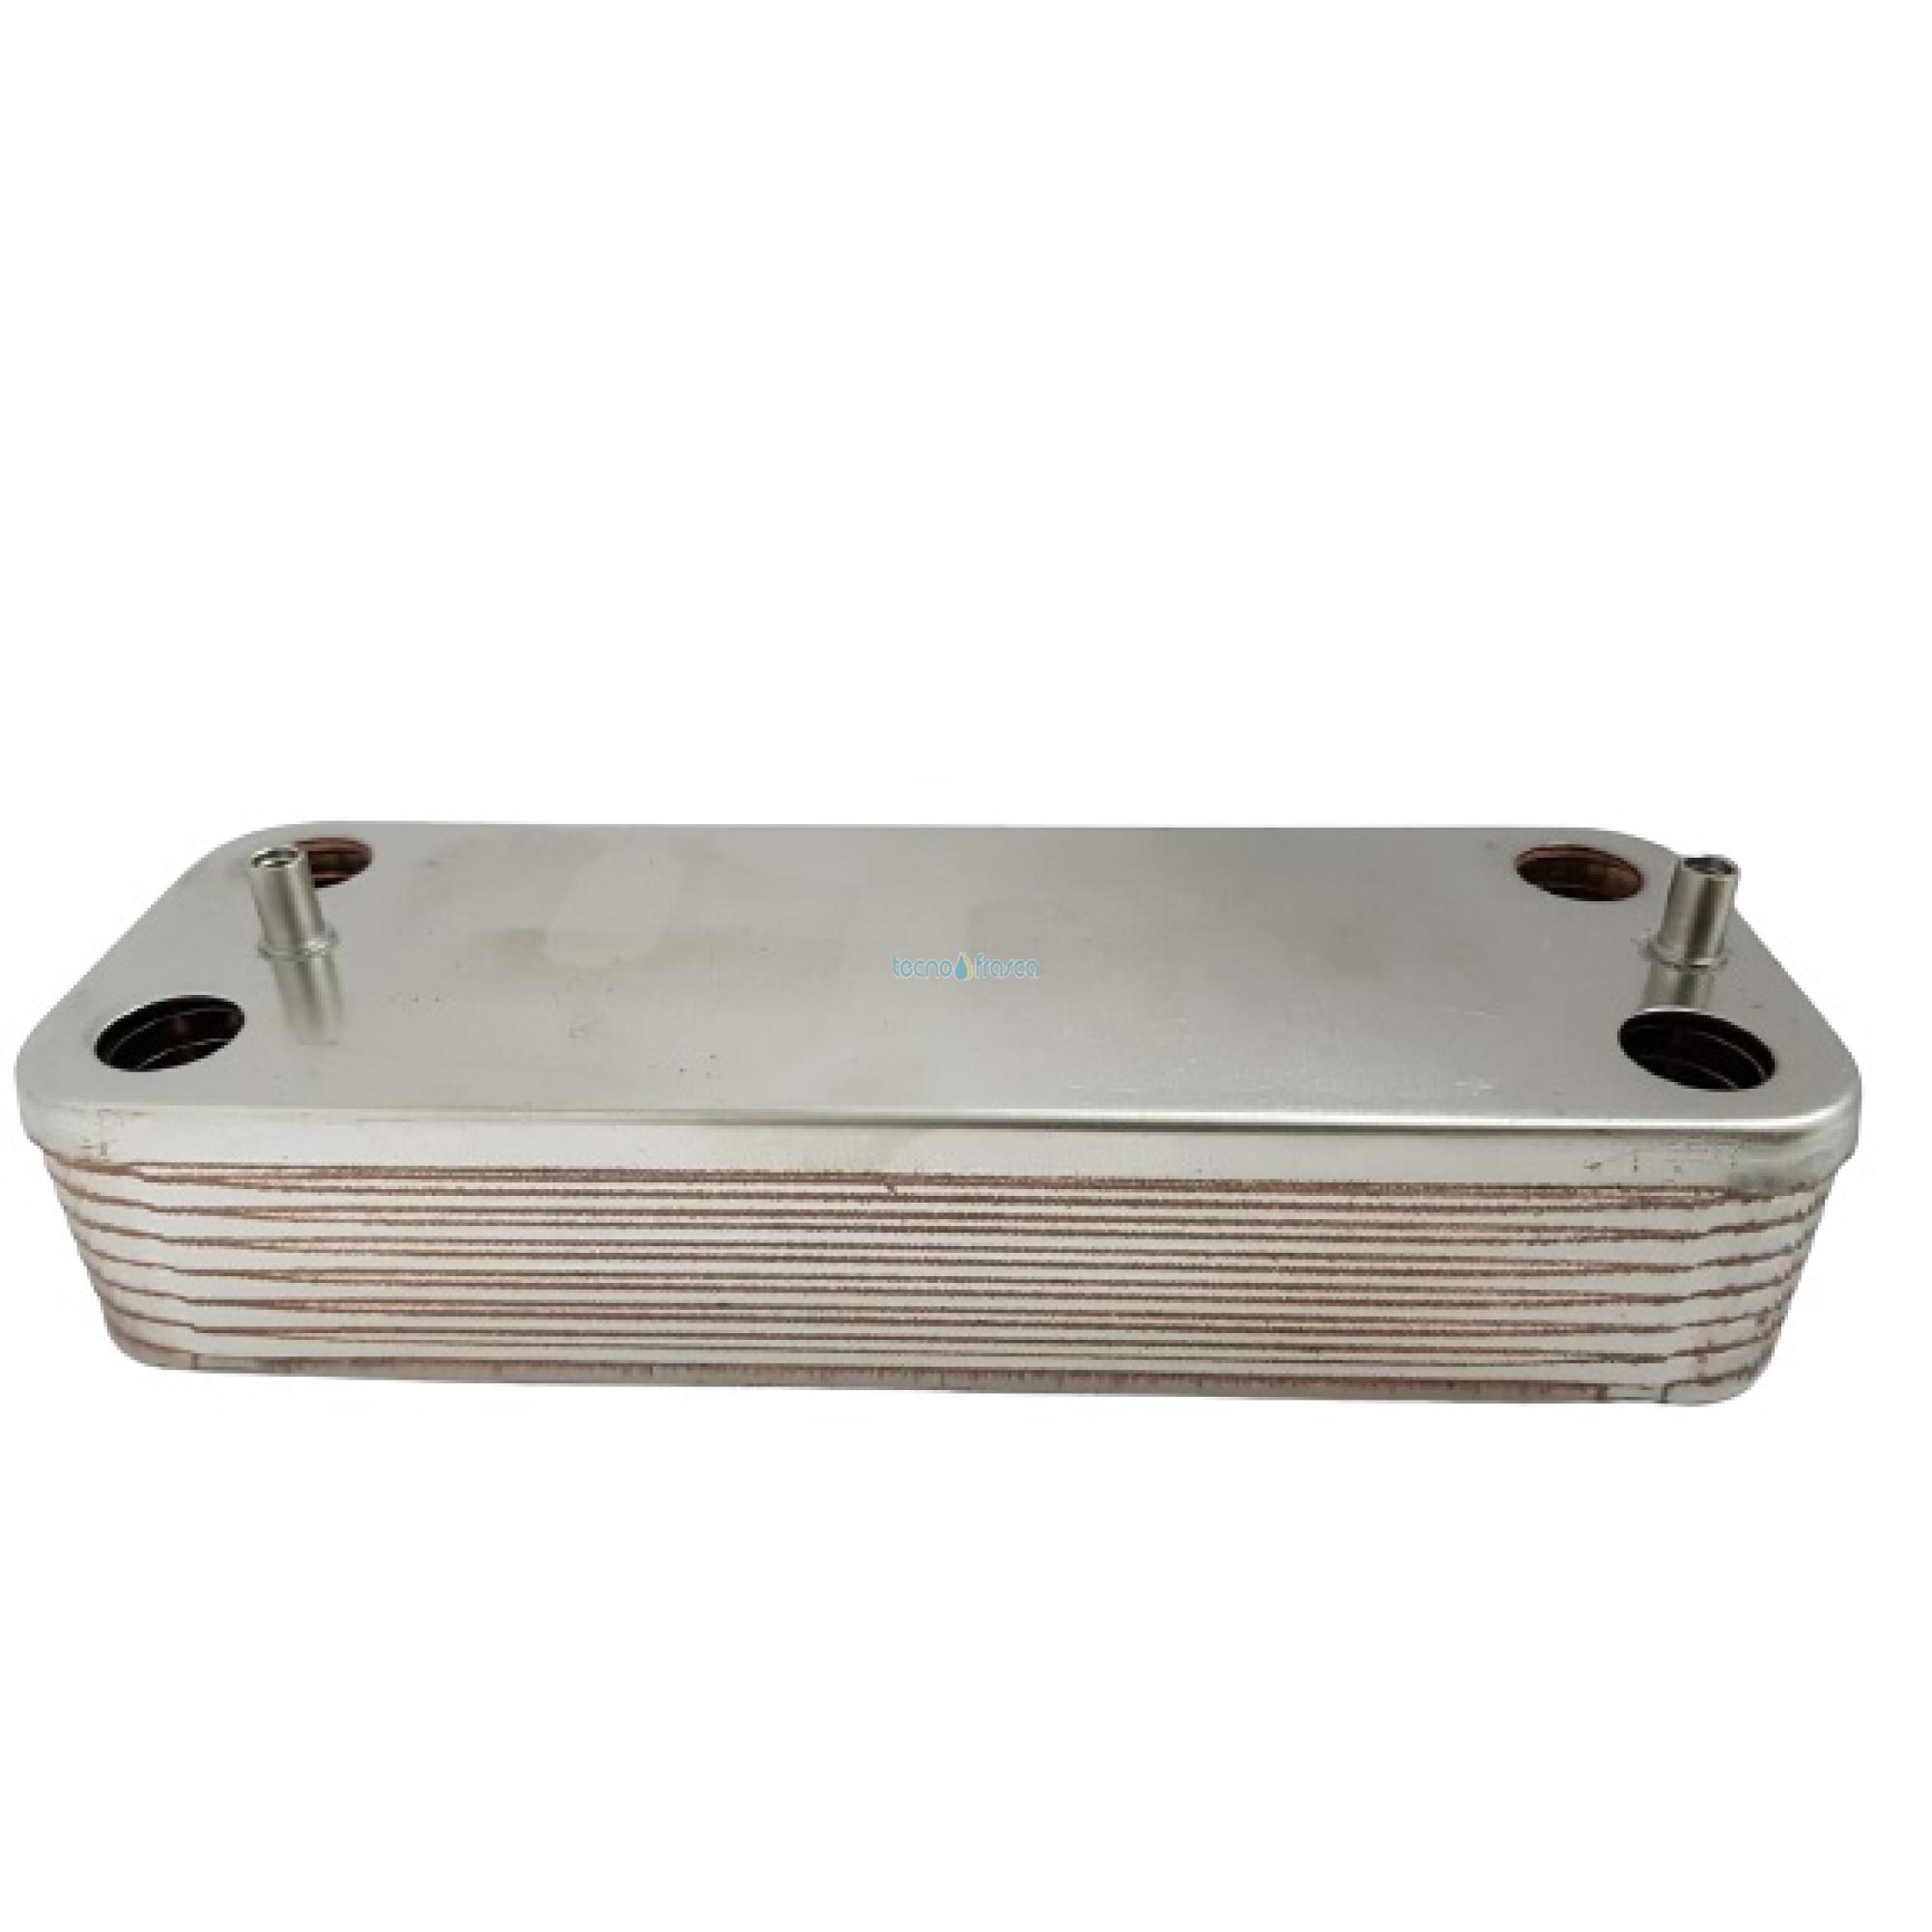 Saunier duval scambiatore 12 piastre s1016600